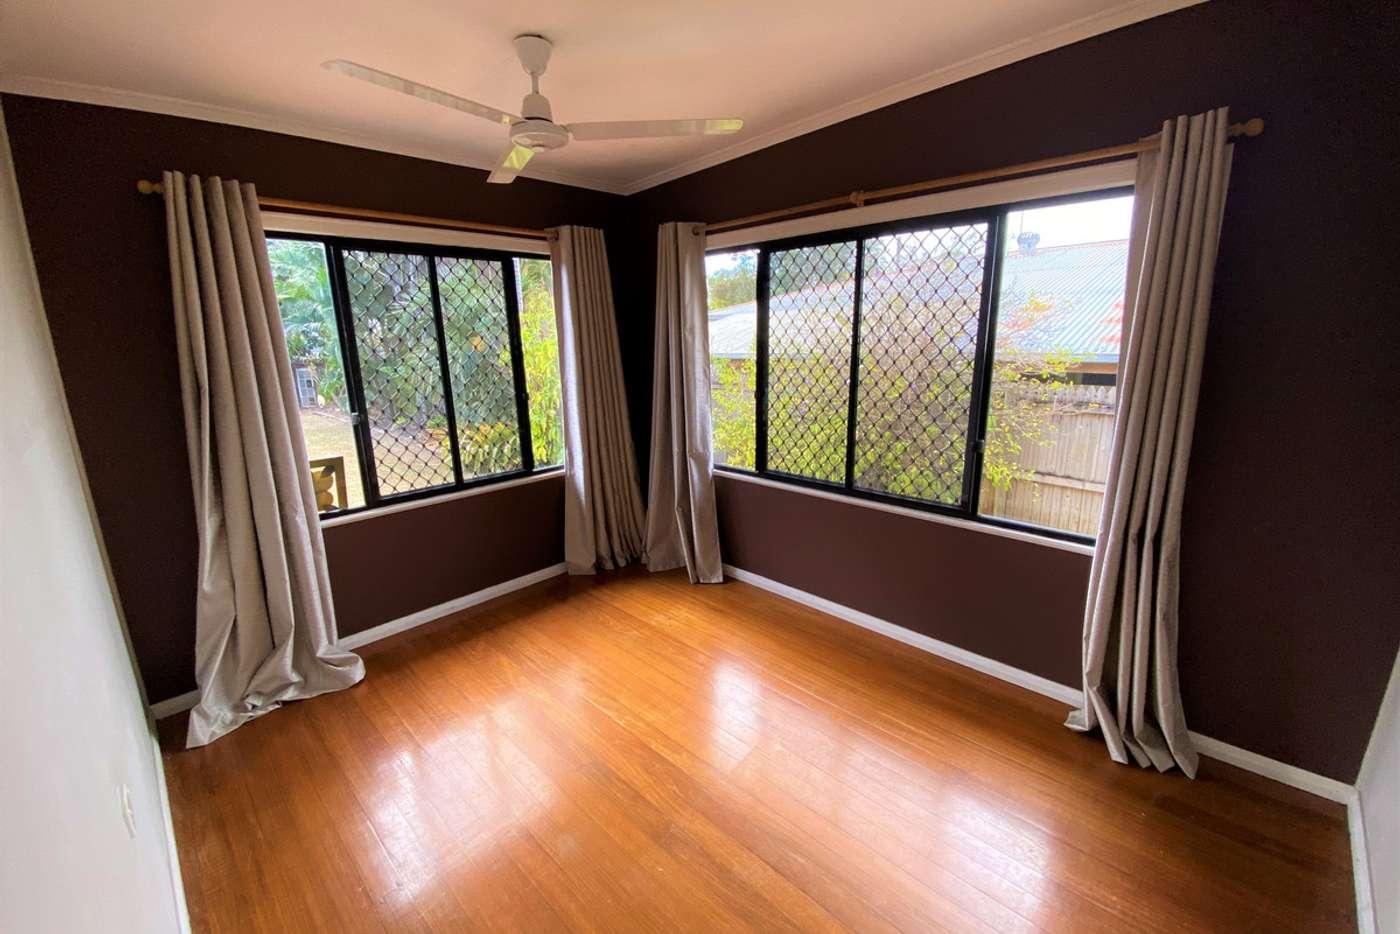 Sixth view of Homely house listing, 8 Meehan Street, Mareeba QLD 4880